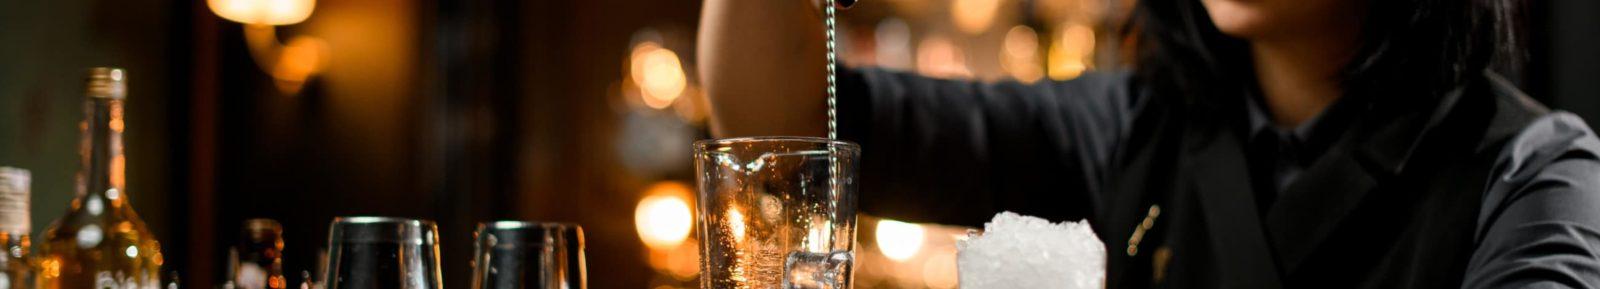 Bartender stirring ice